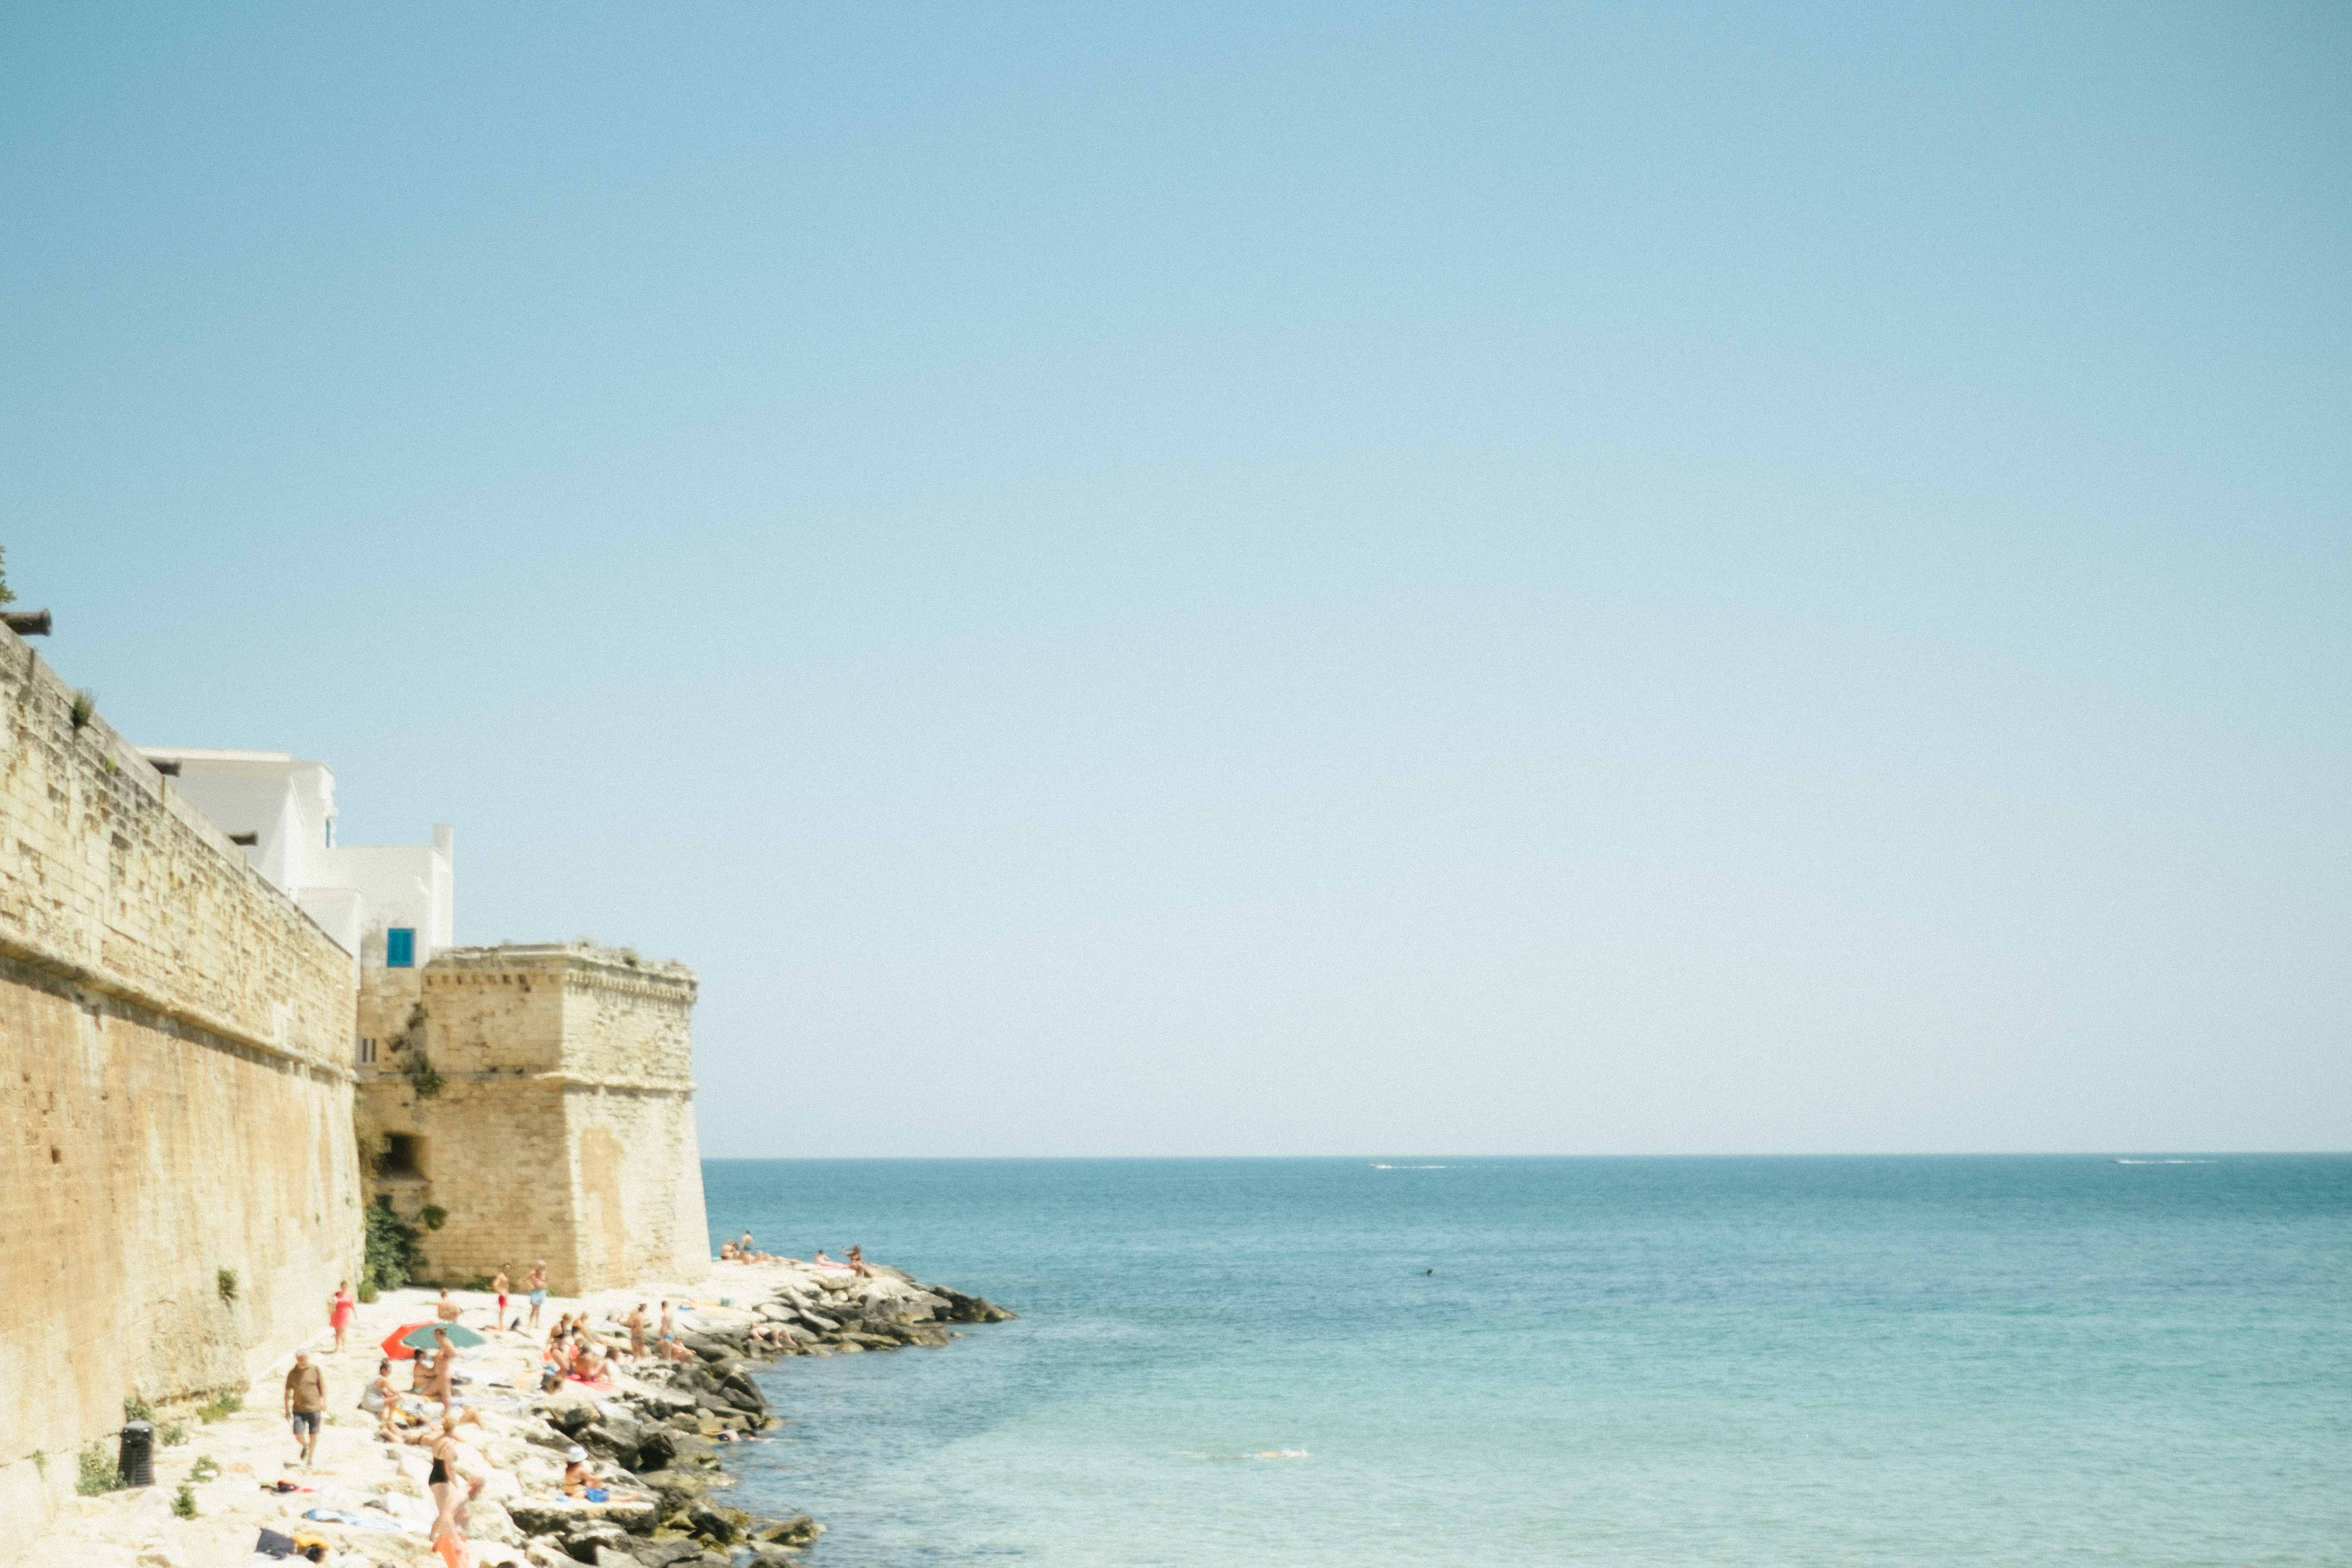 Пляж Cala Porta Vecchia